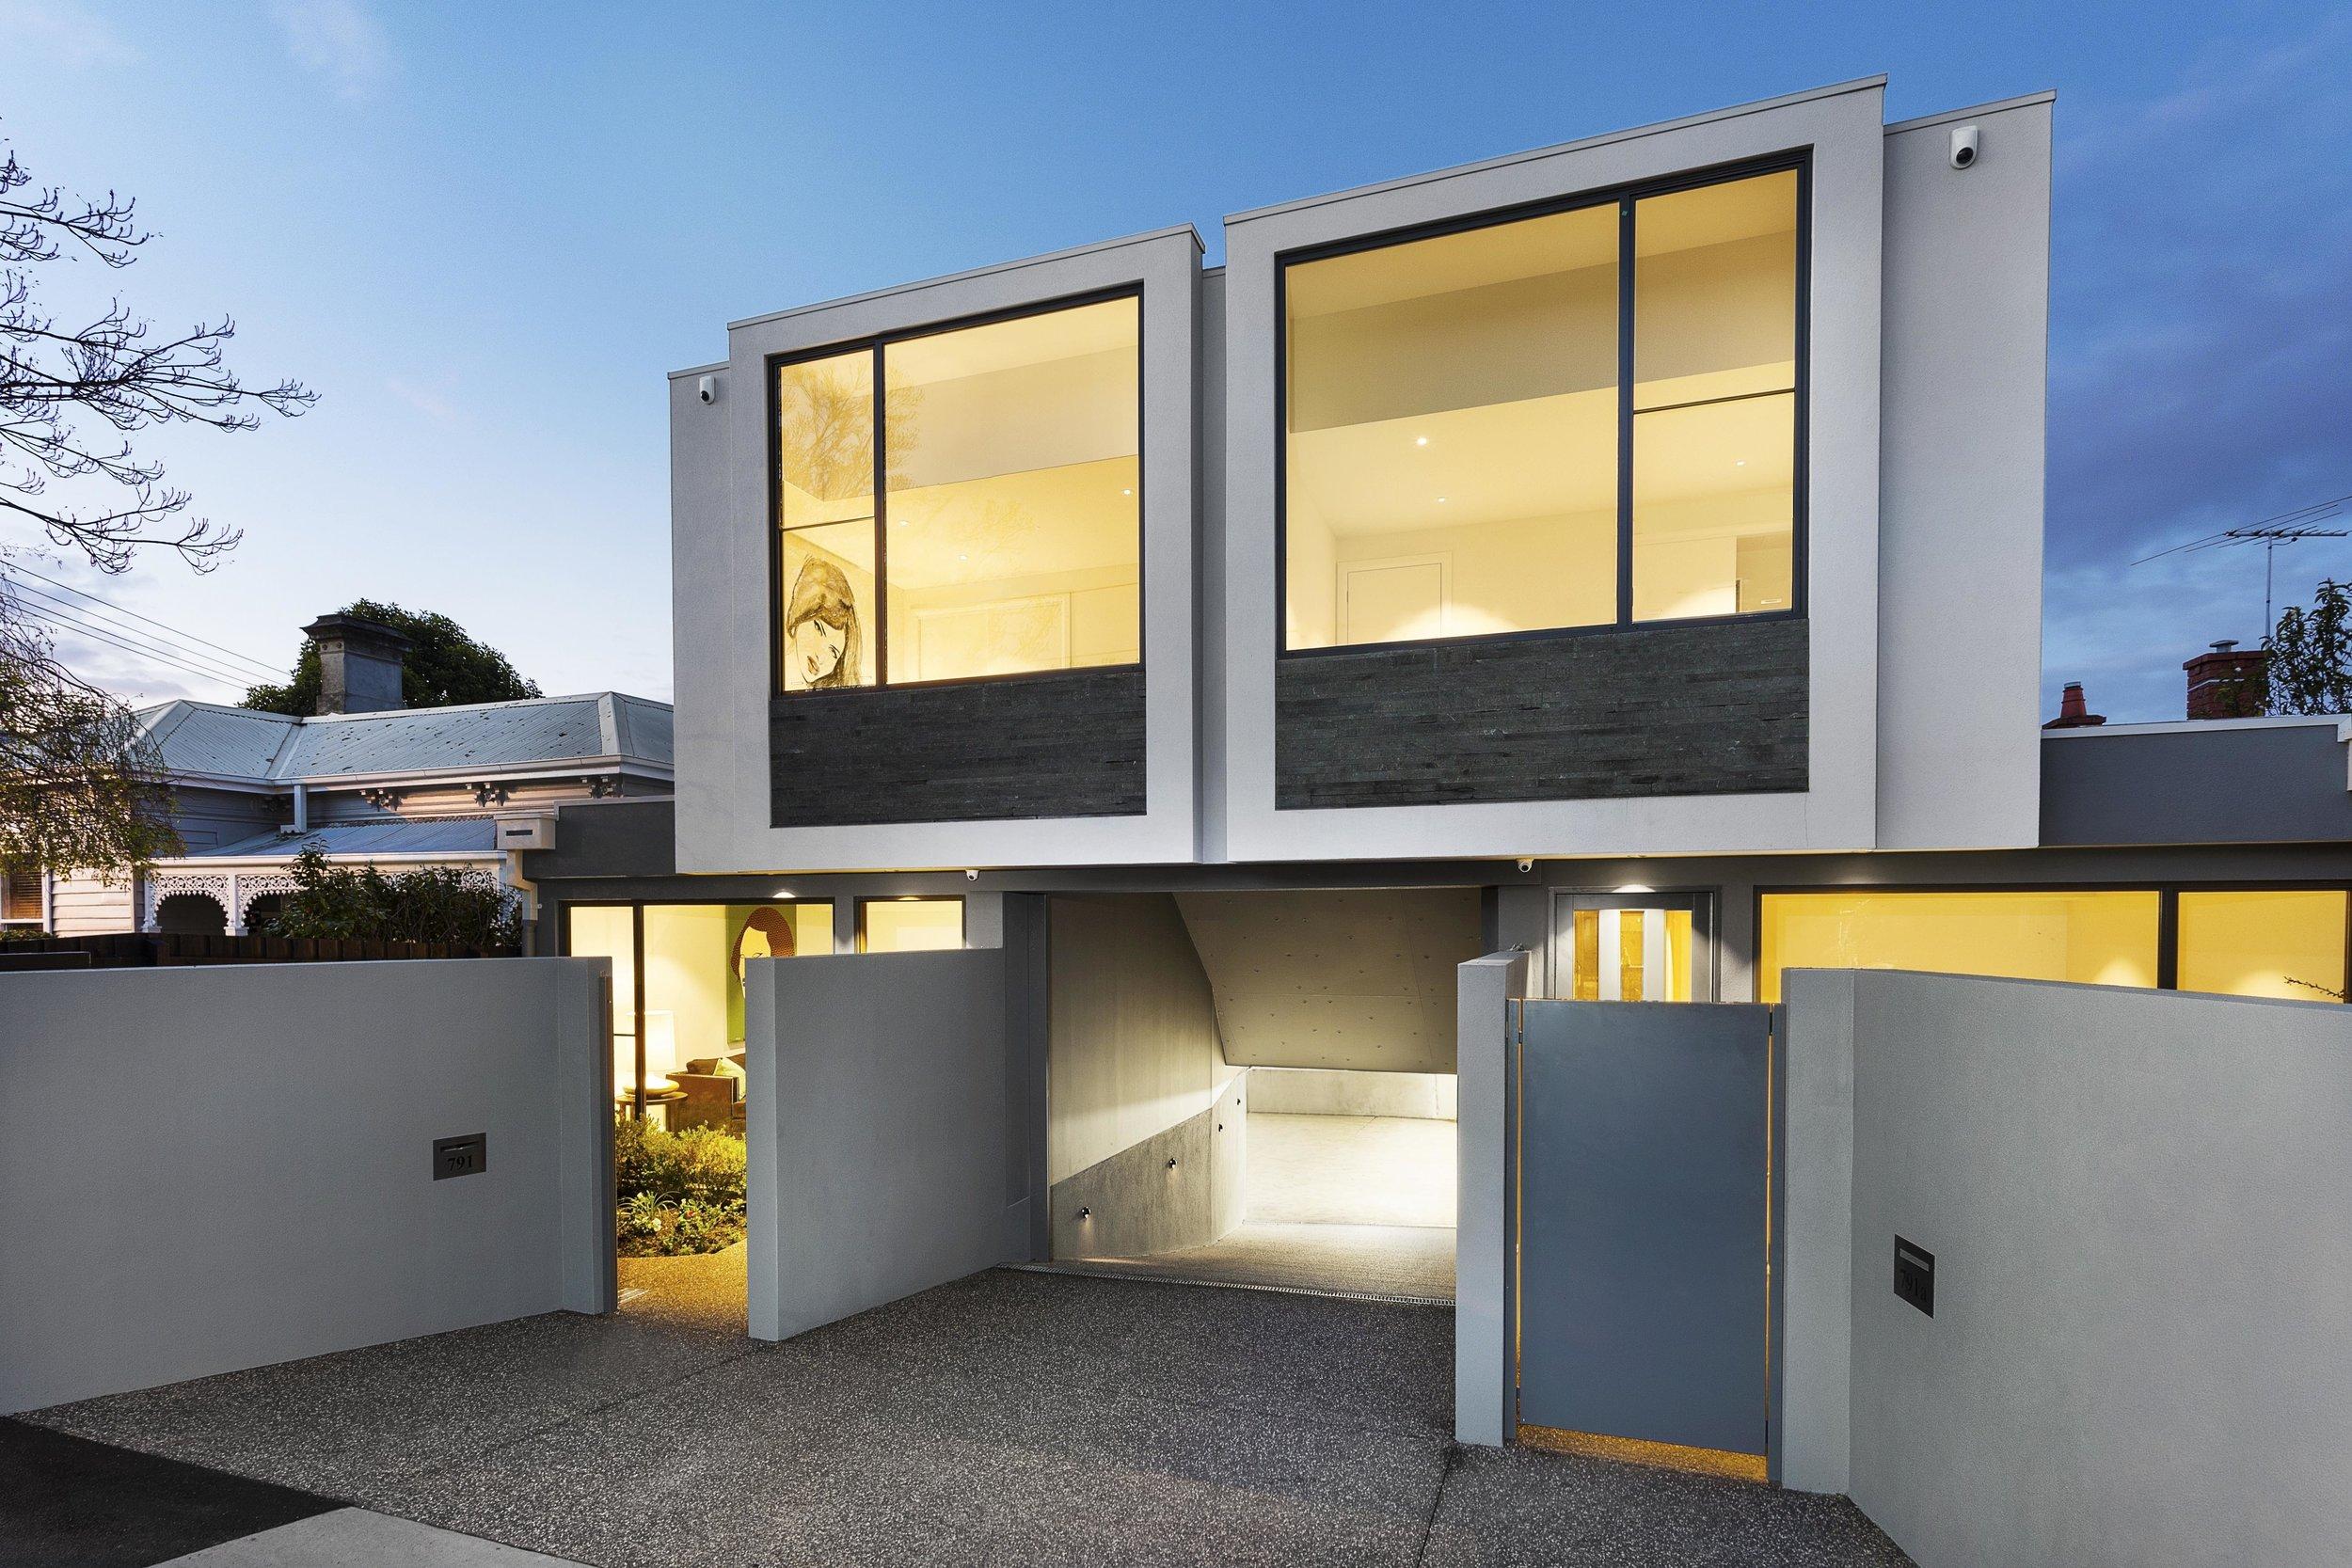 Armadale-Residence-Guymer-Bailey-Architects-01.jpg